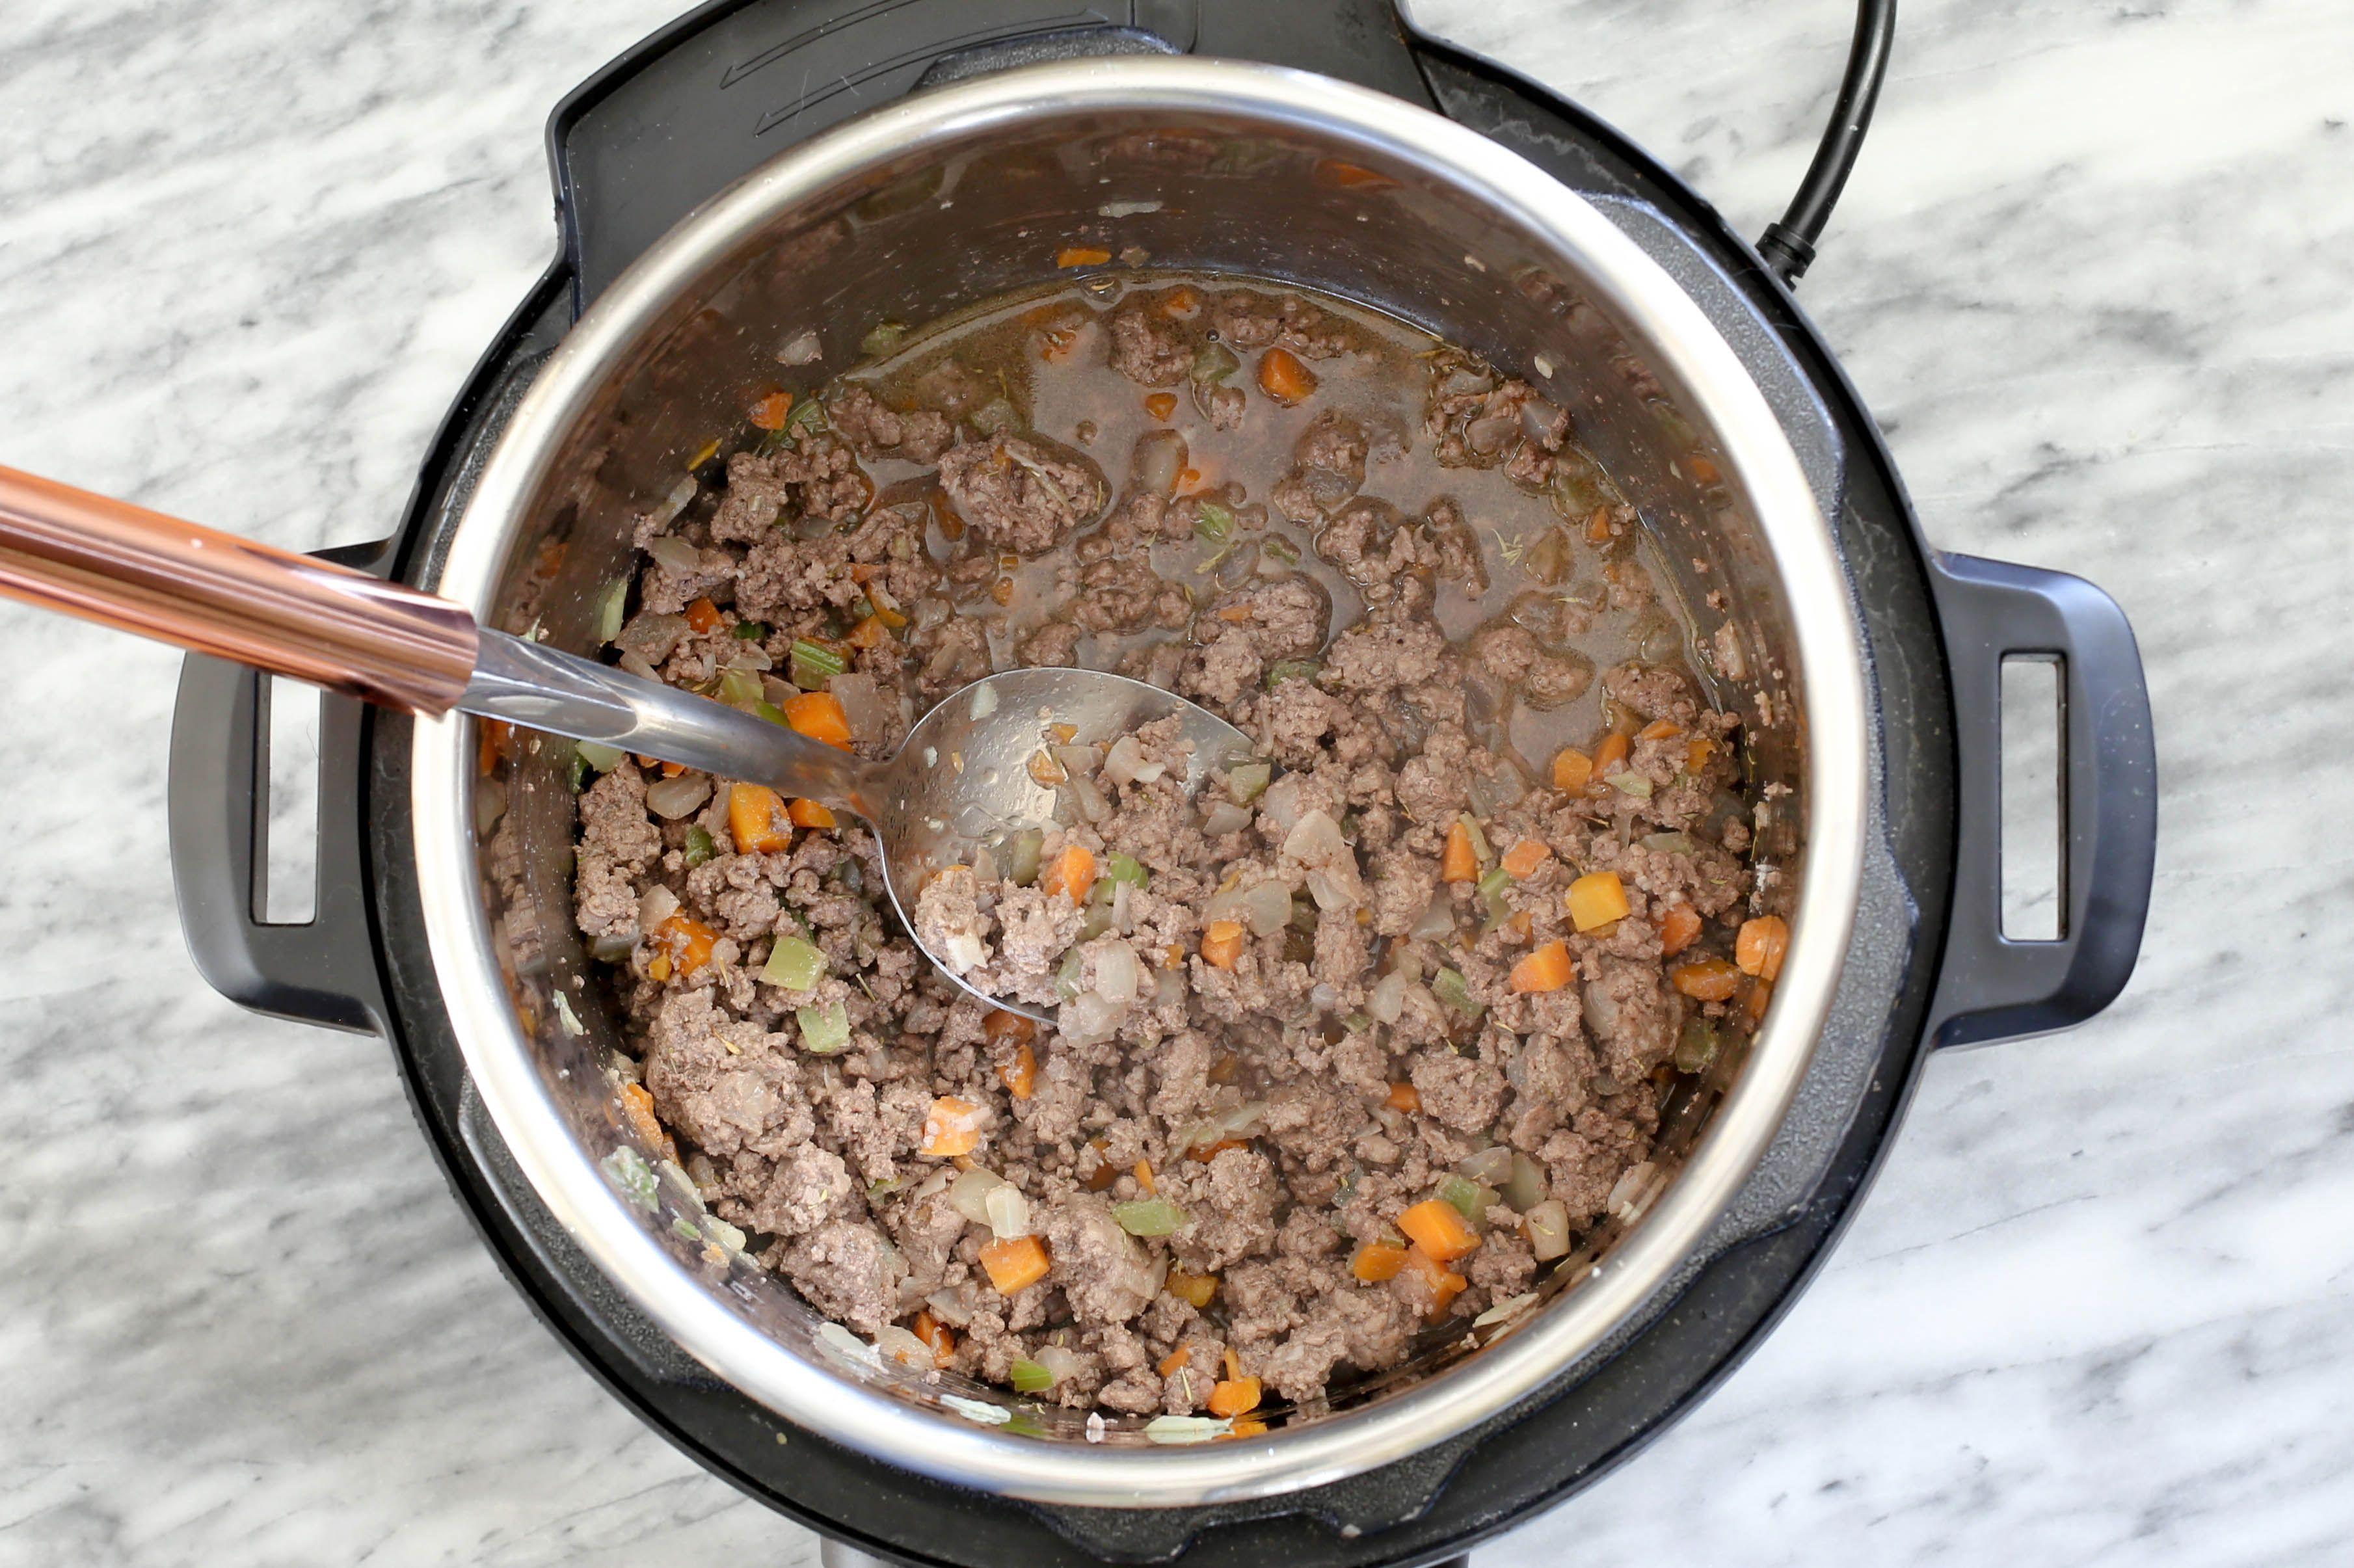 Making Instant Pot Bolognese sauce